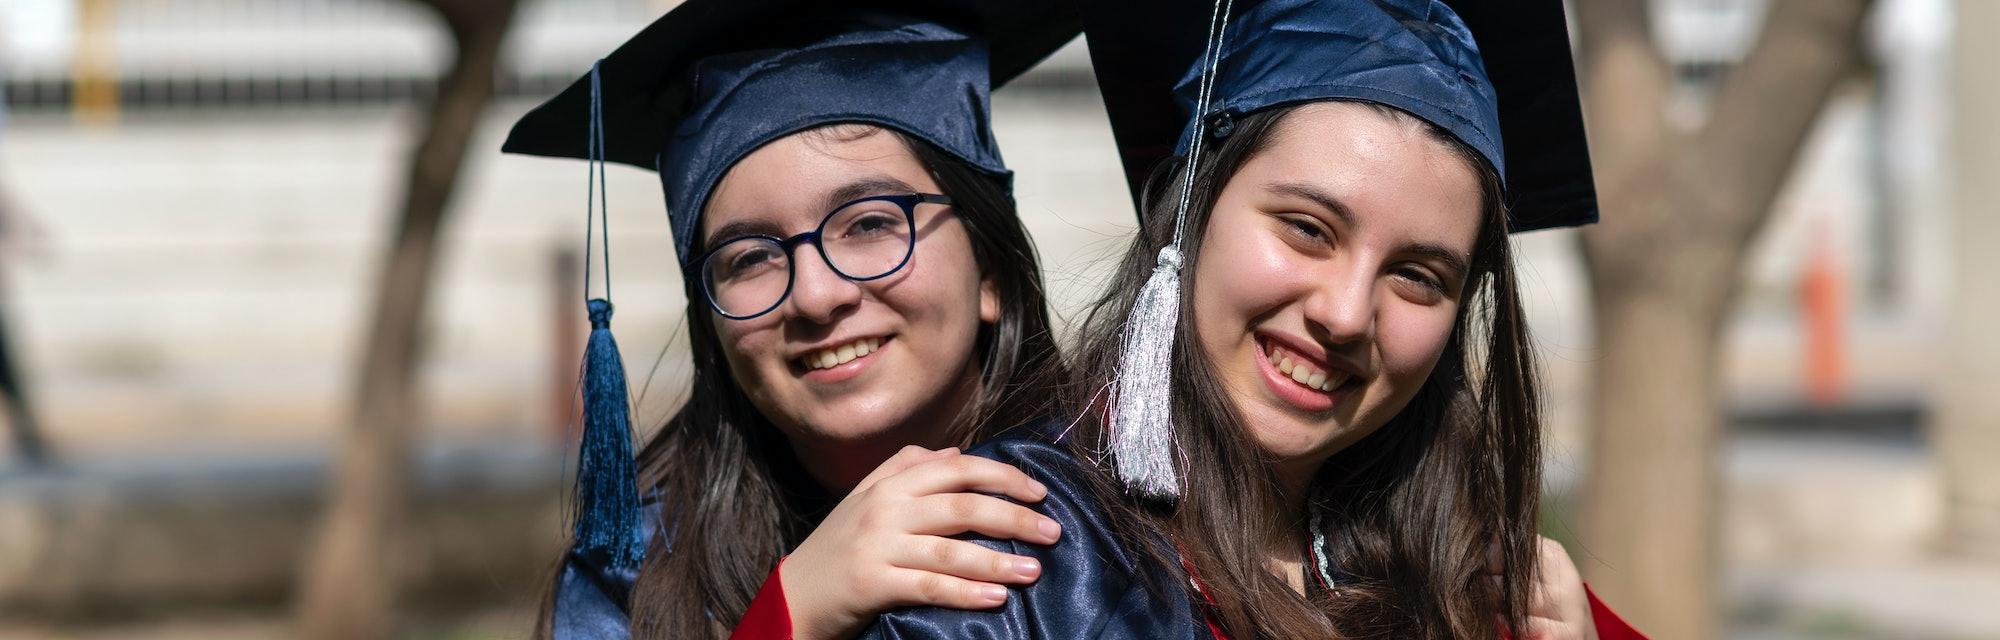 Gratuated student girls